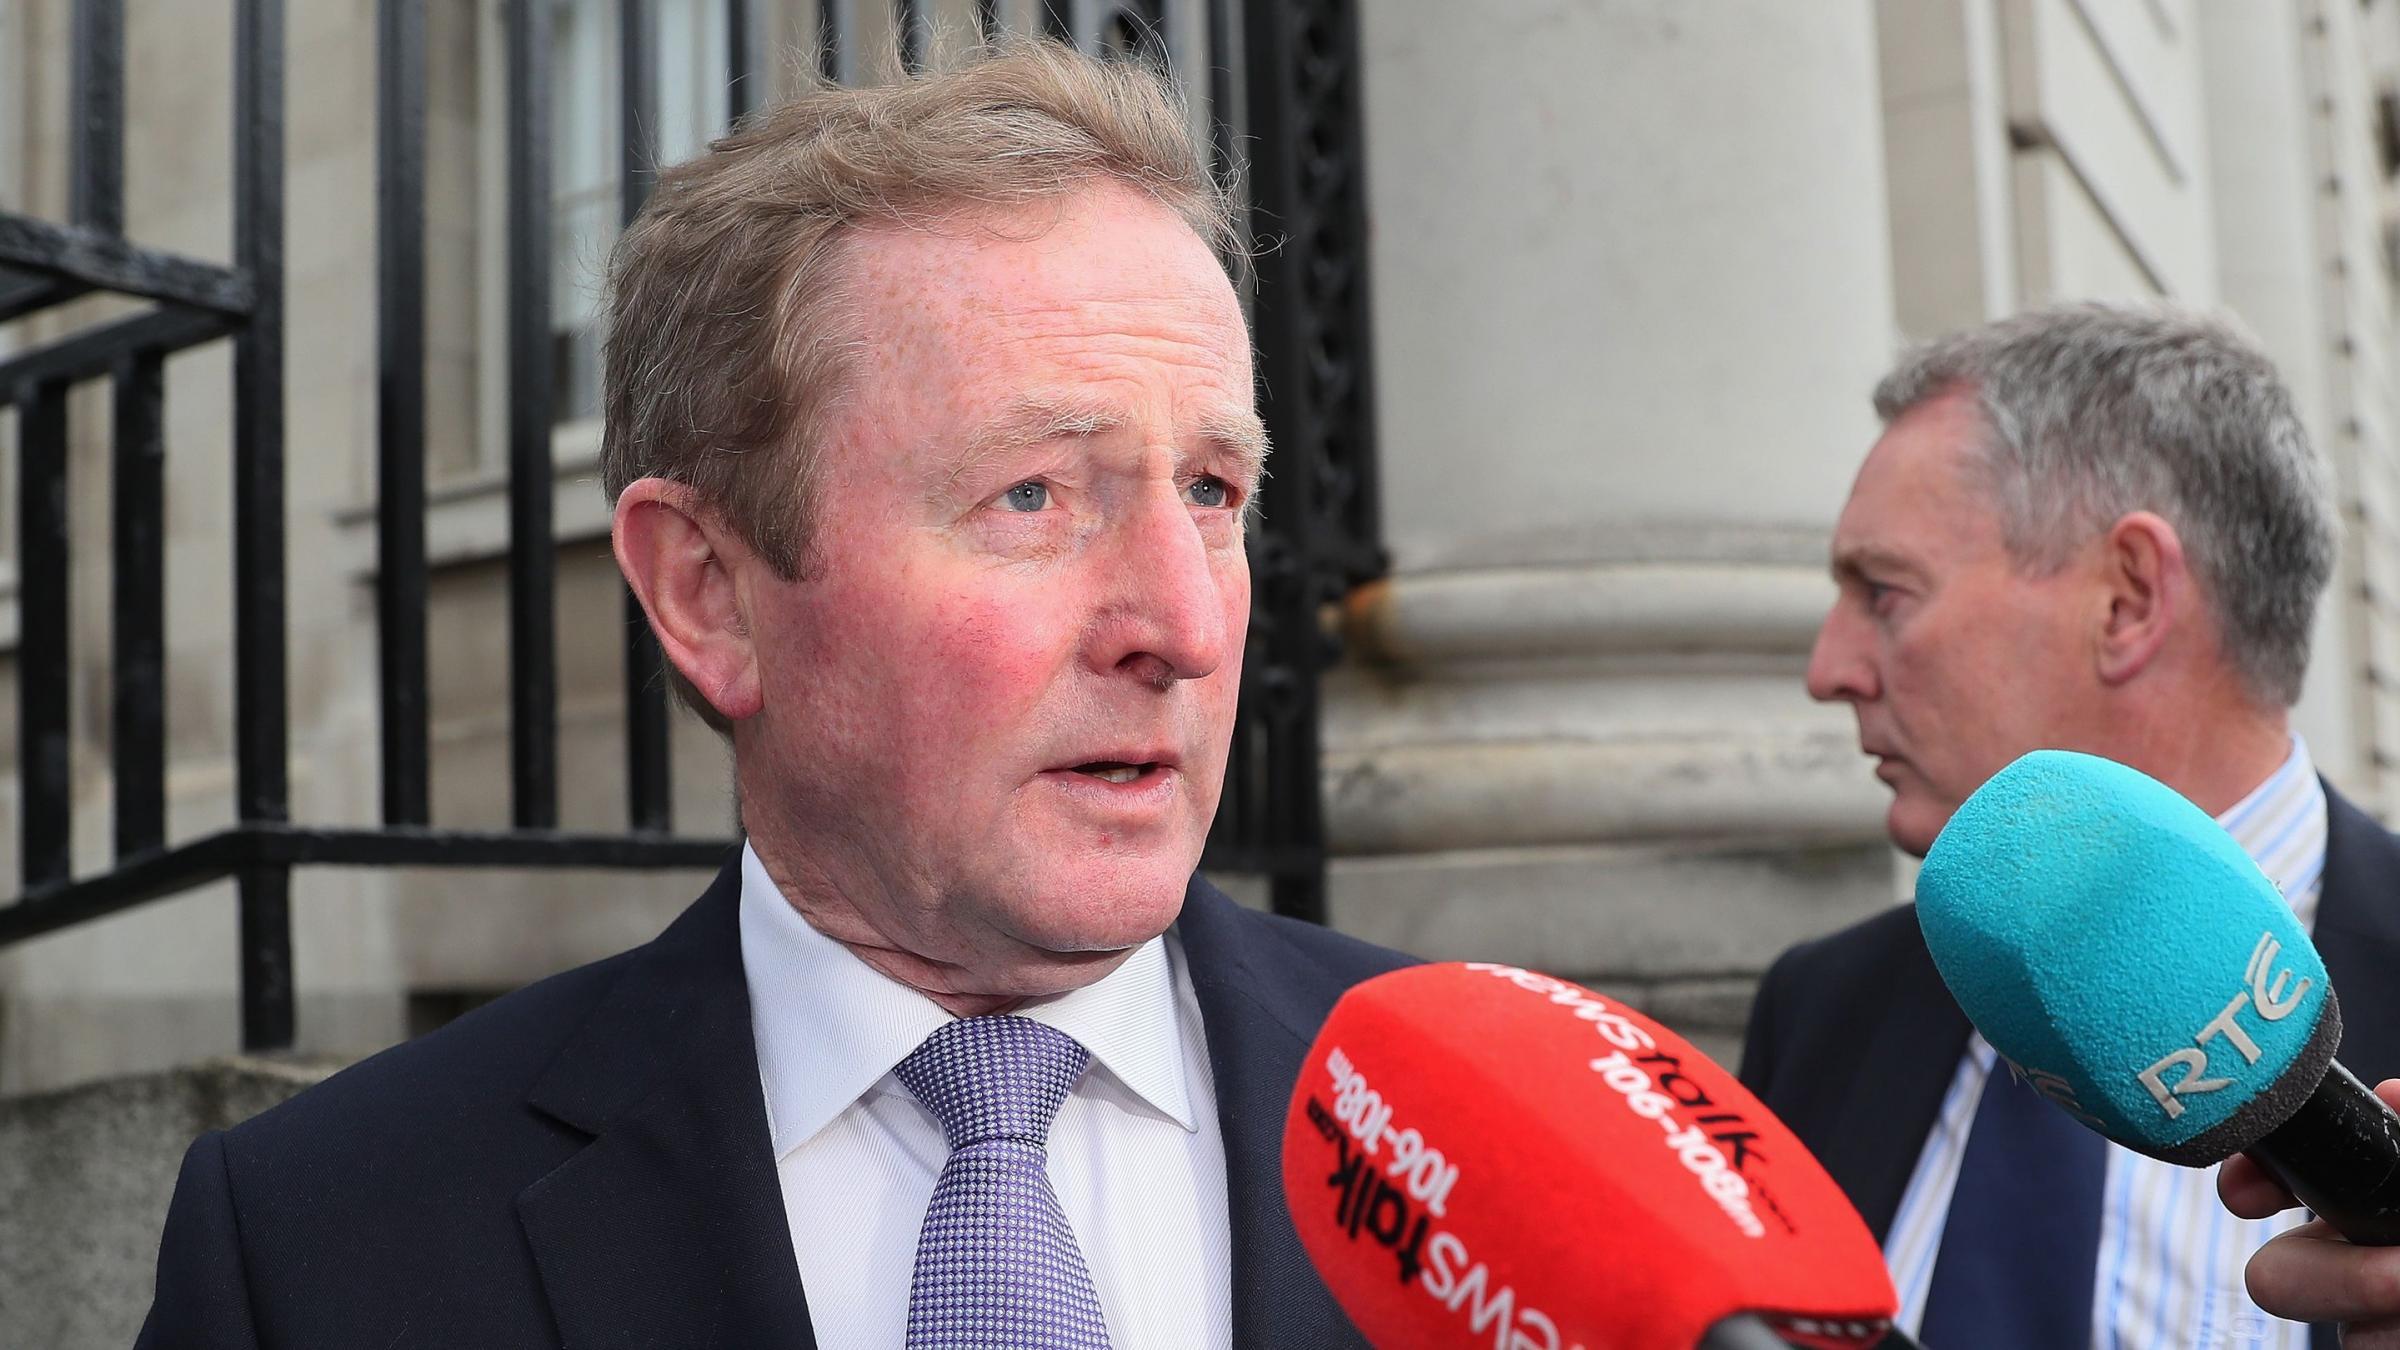 Leo Varadkar set to become Taoiseach